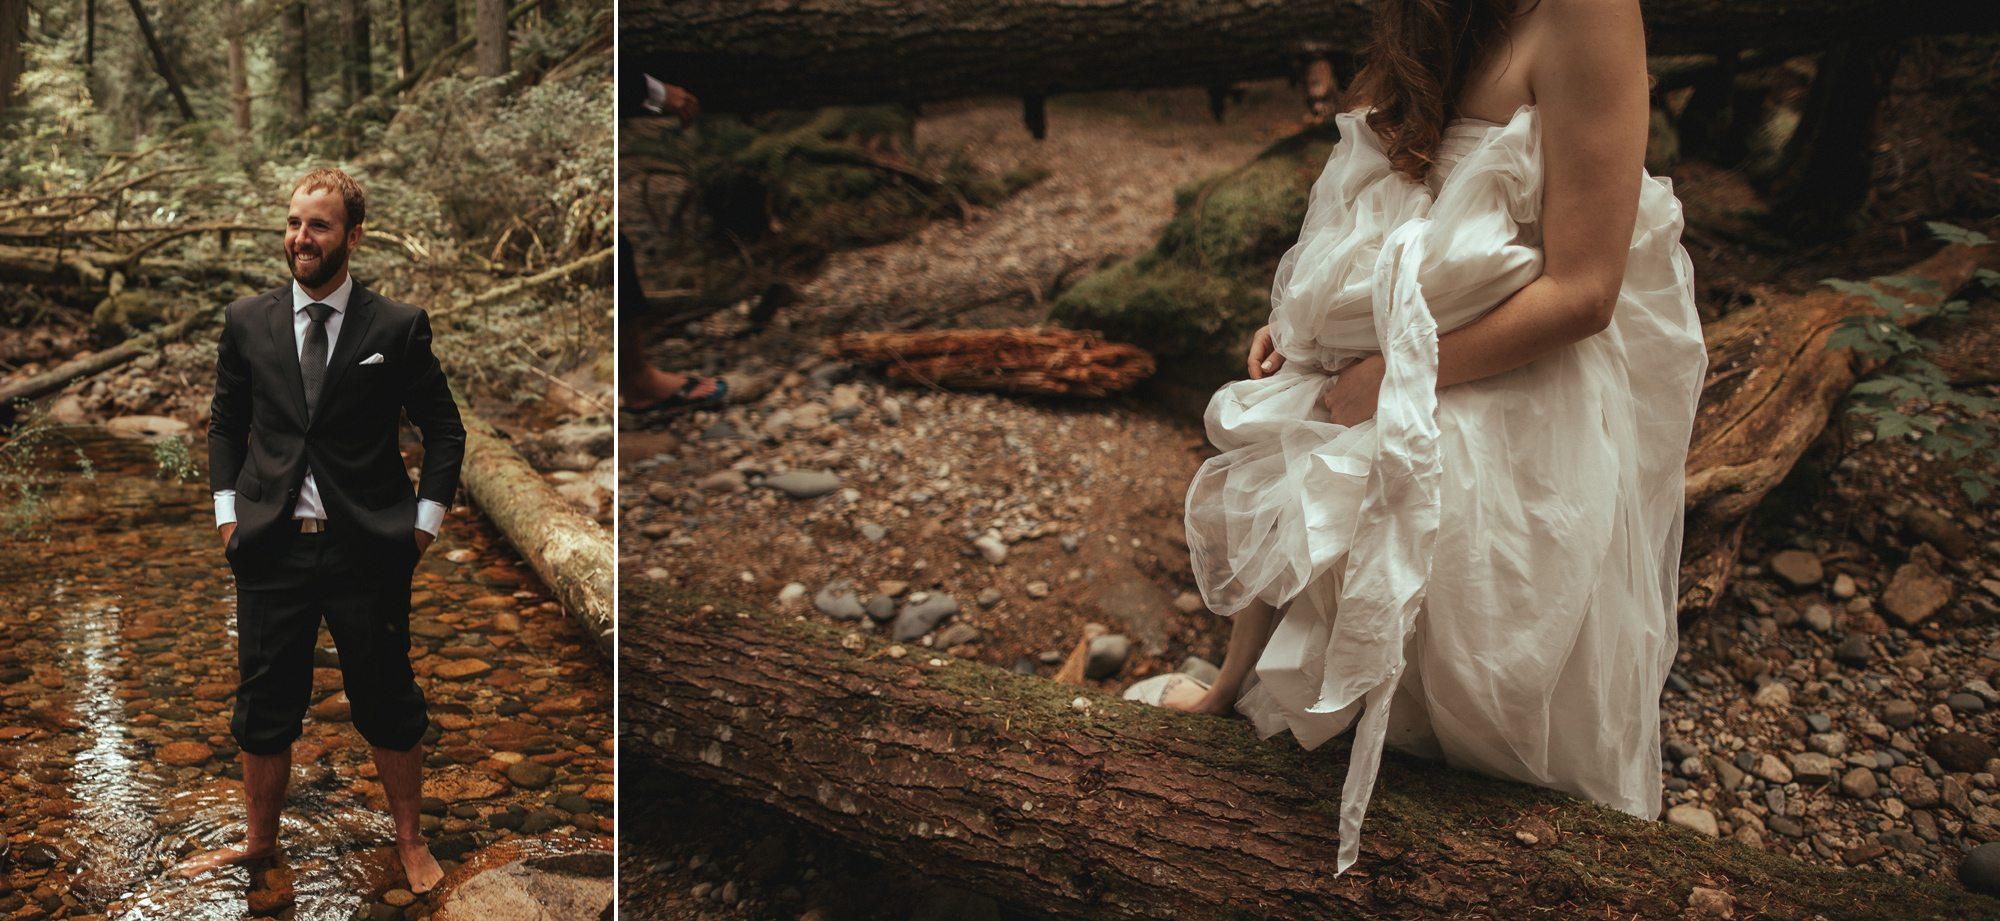 gibsons-wedding-photography-robert-devon42